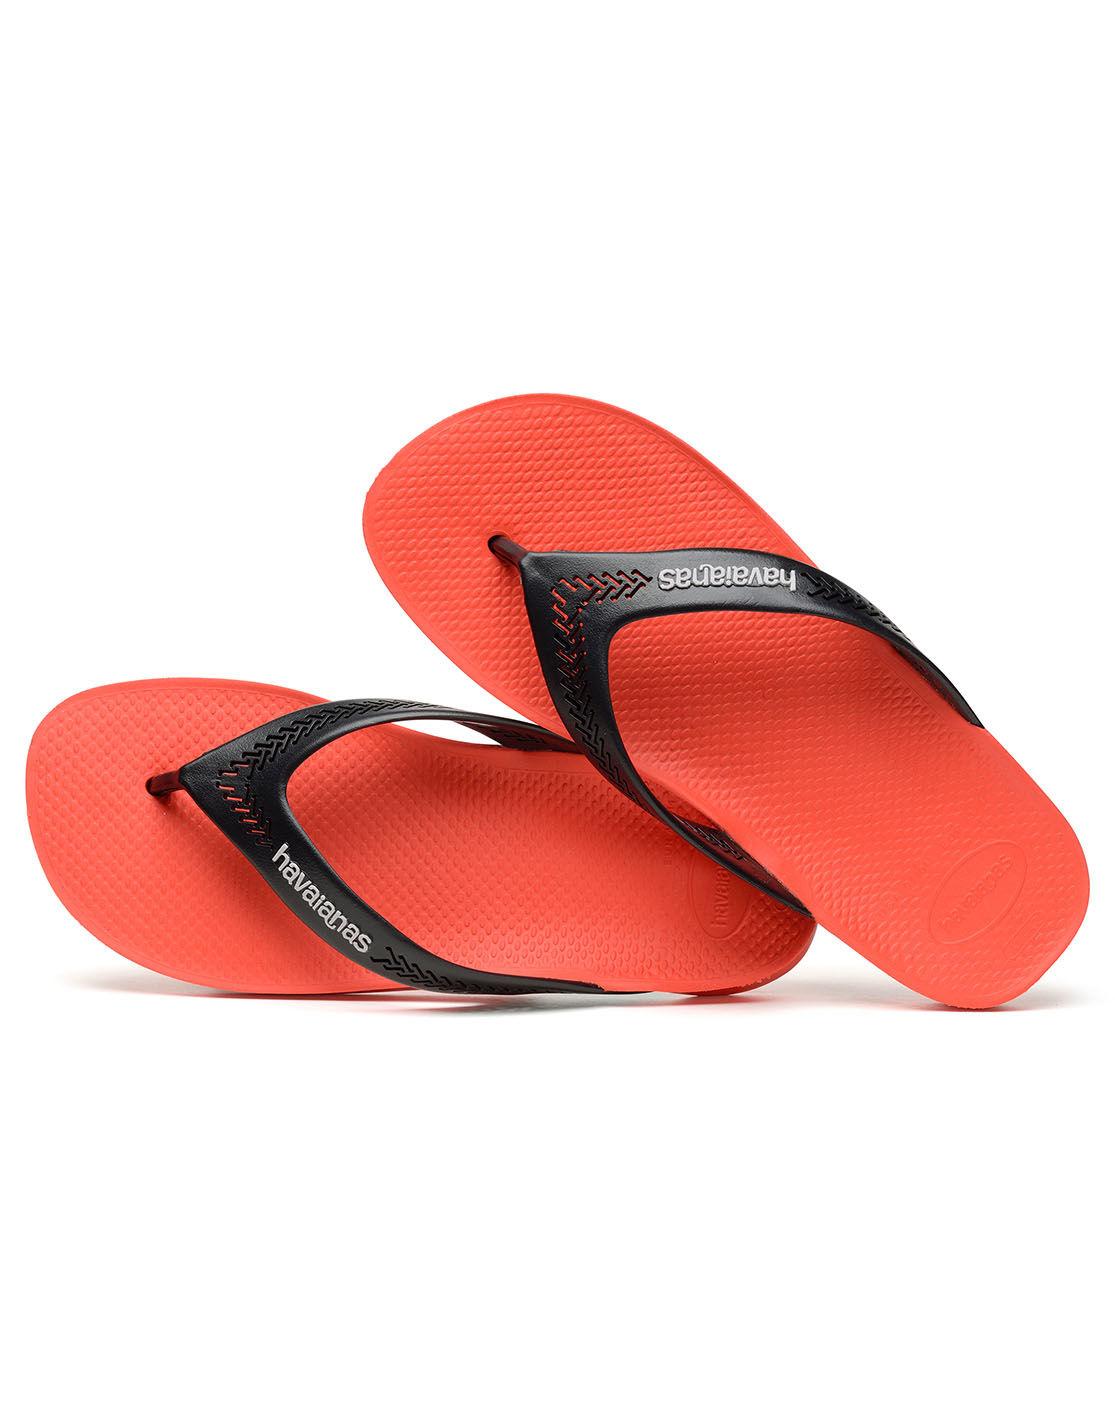 Havaianas Wide Red Flip Flops In Red For Men Lyst